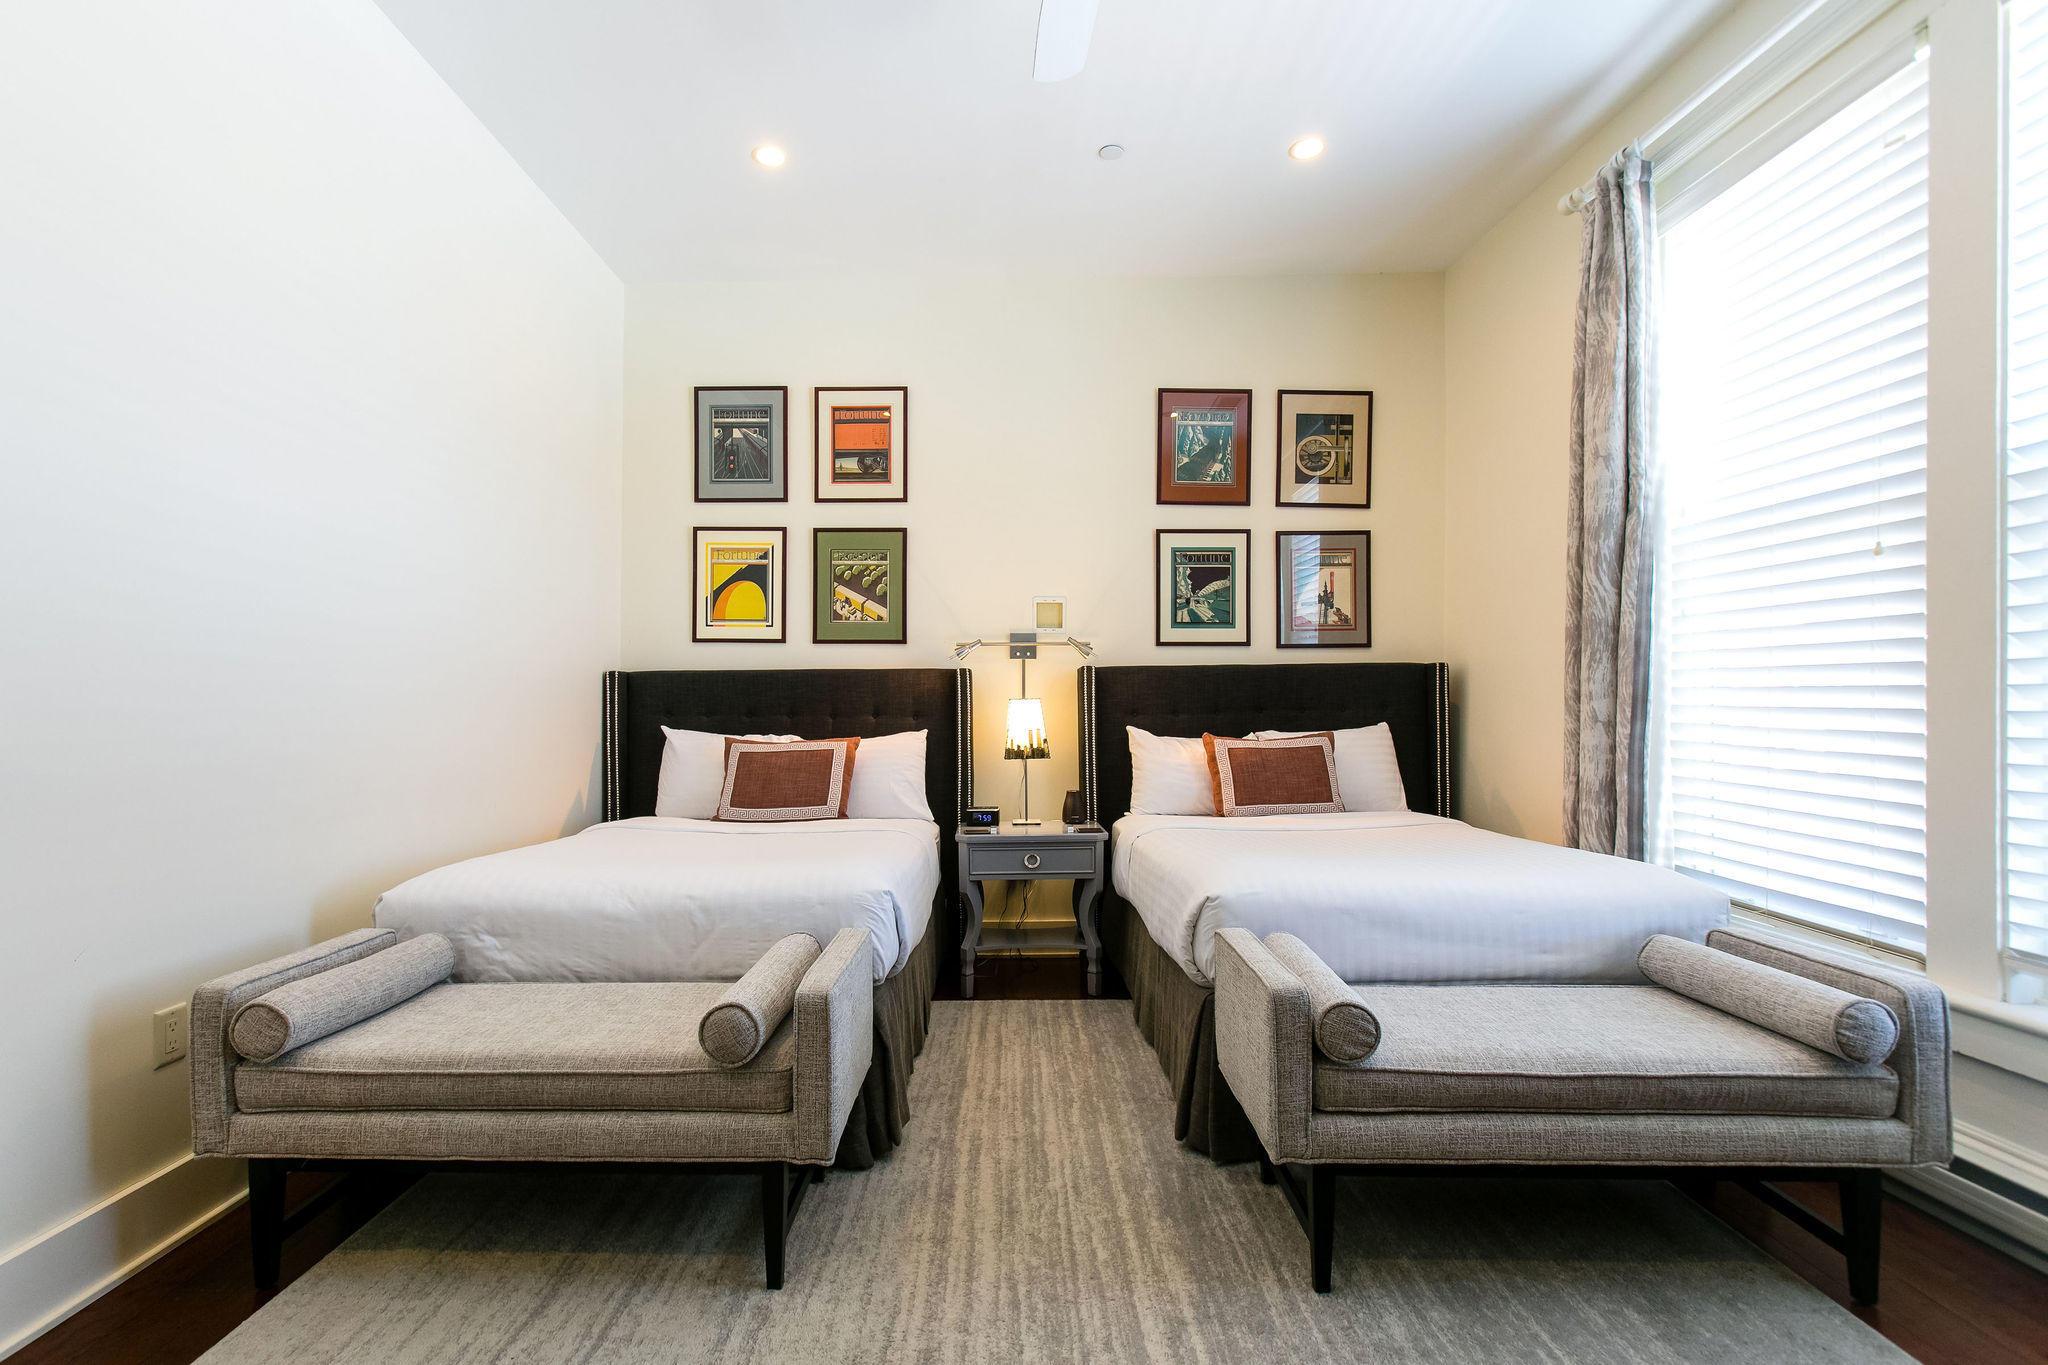 Property located at 281 Main St Great Barrington MA 01230 photo